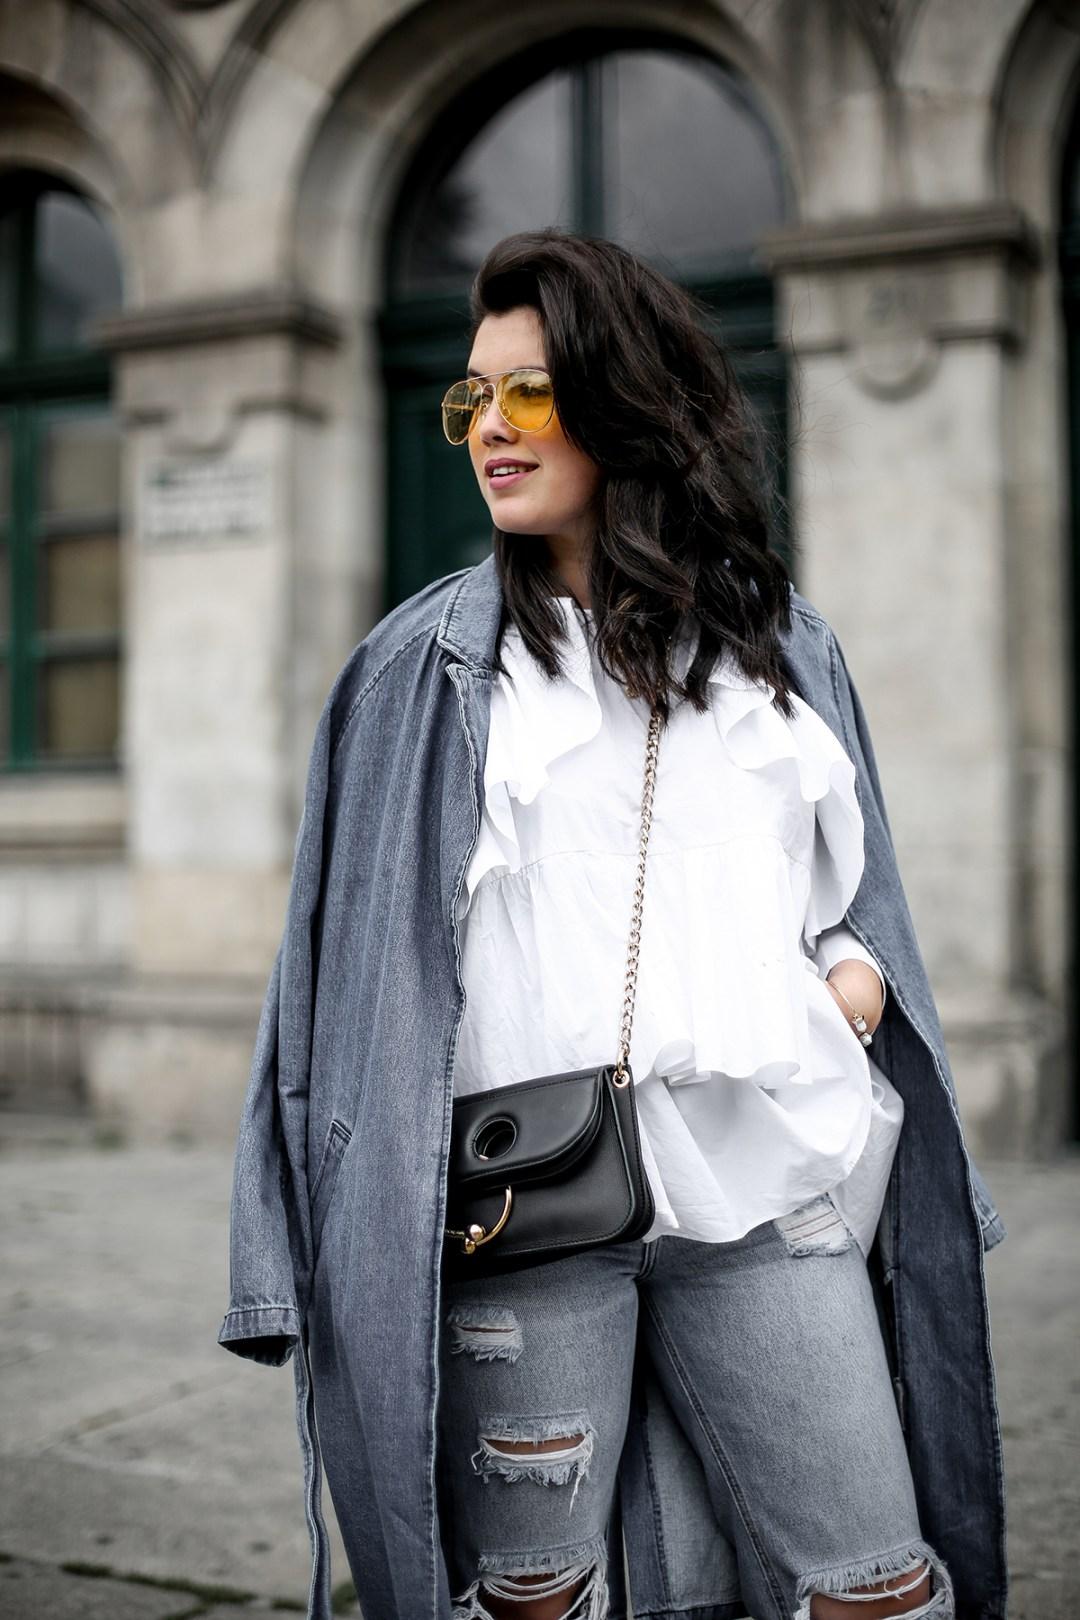 trench-denim-ripped-jeans-ruffle-blouse-zara-streetstyle14